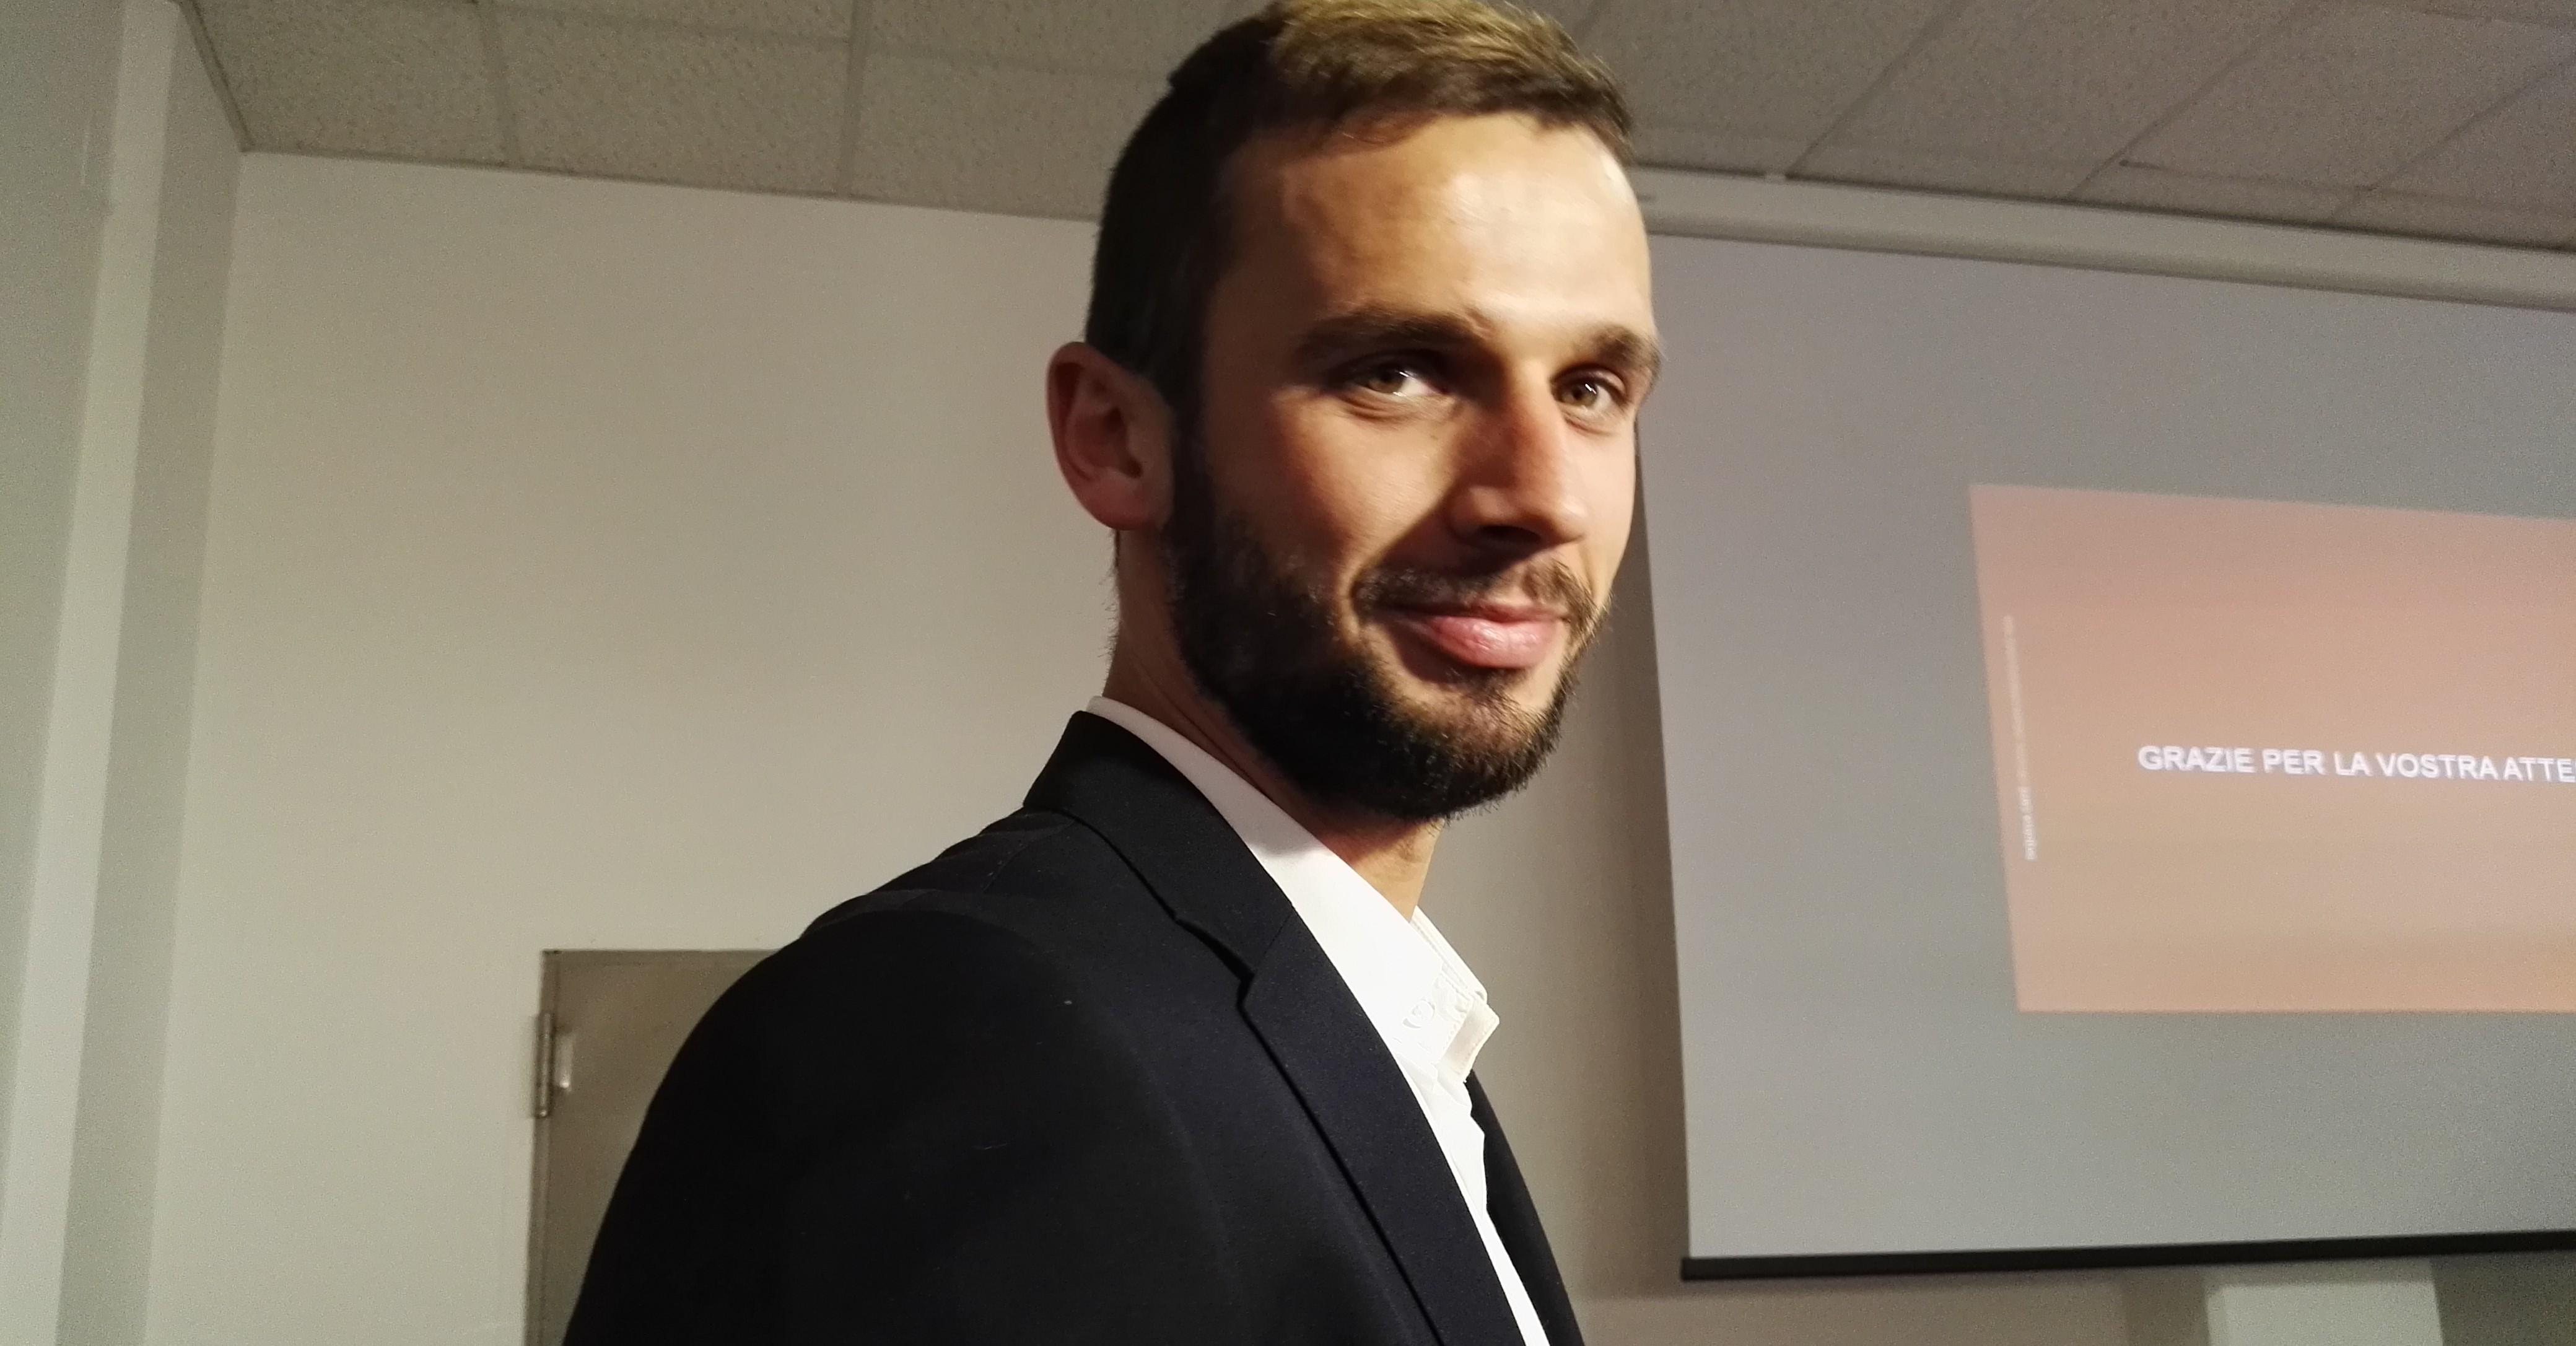 Dario-Zuparic-difensore-del-Pescara